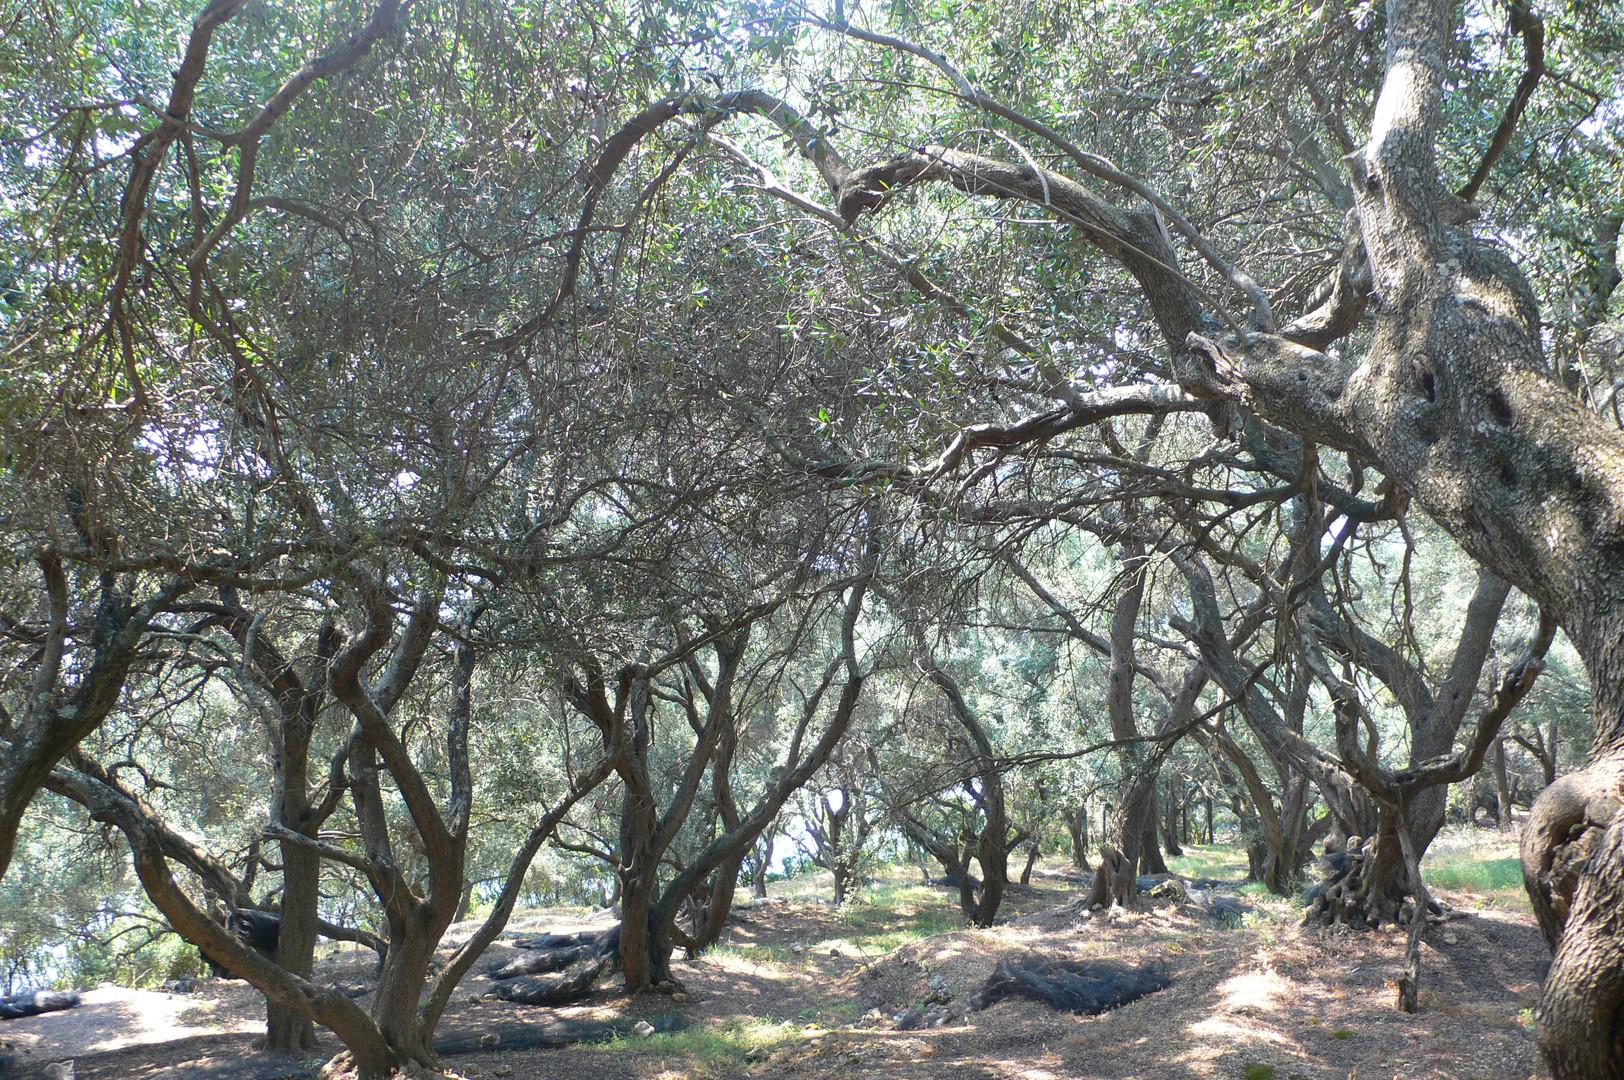 oliverhain